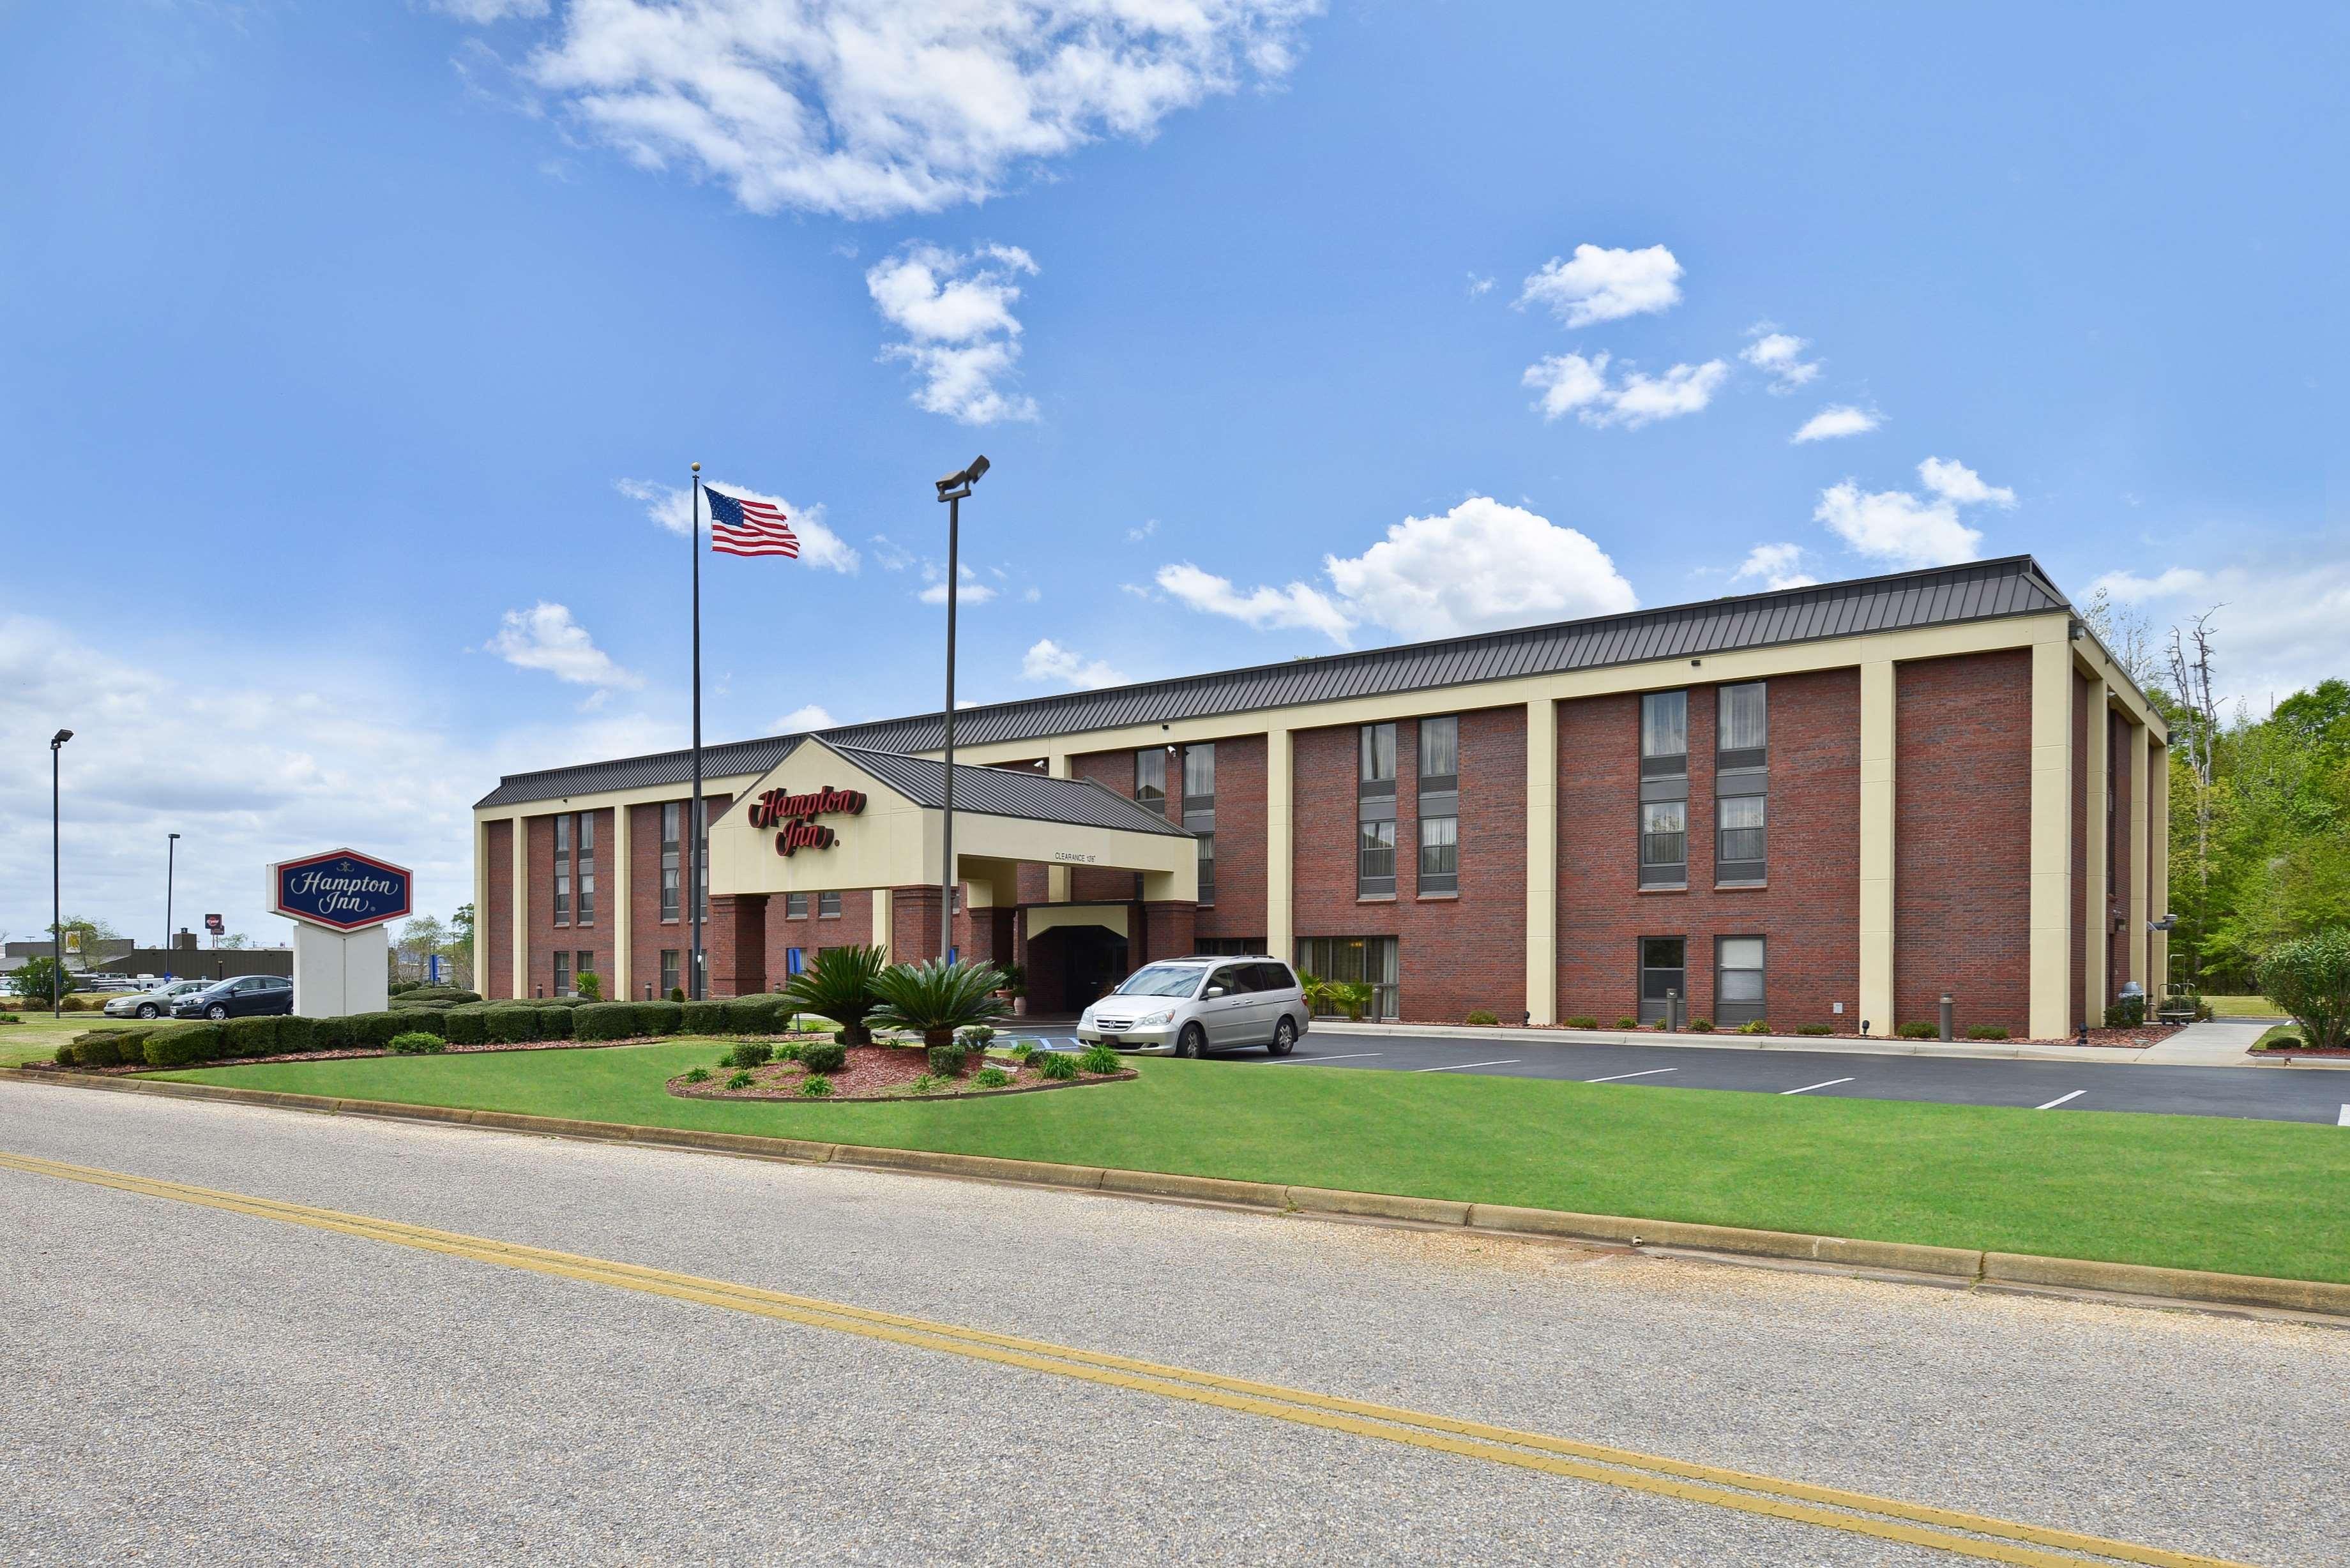 Hampton Inn Greenville image 4